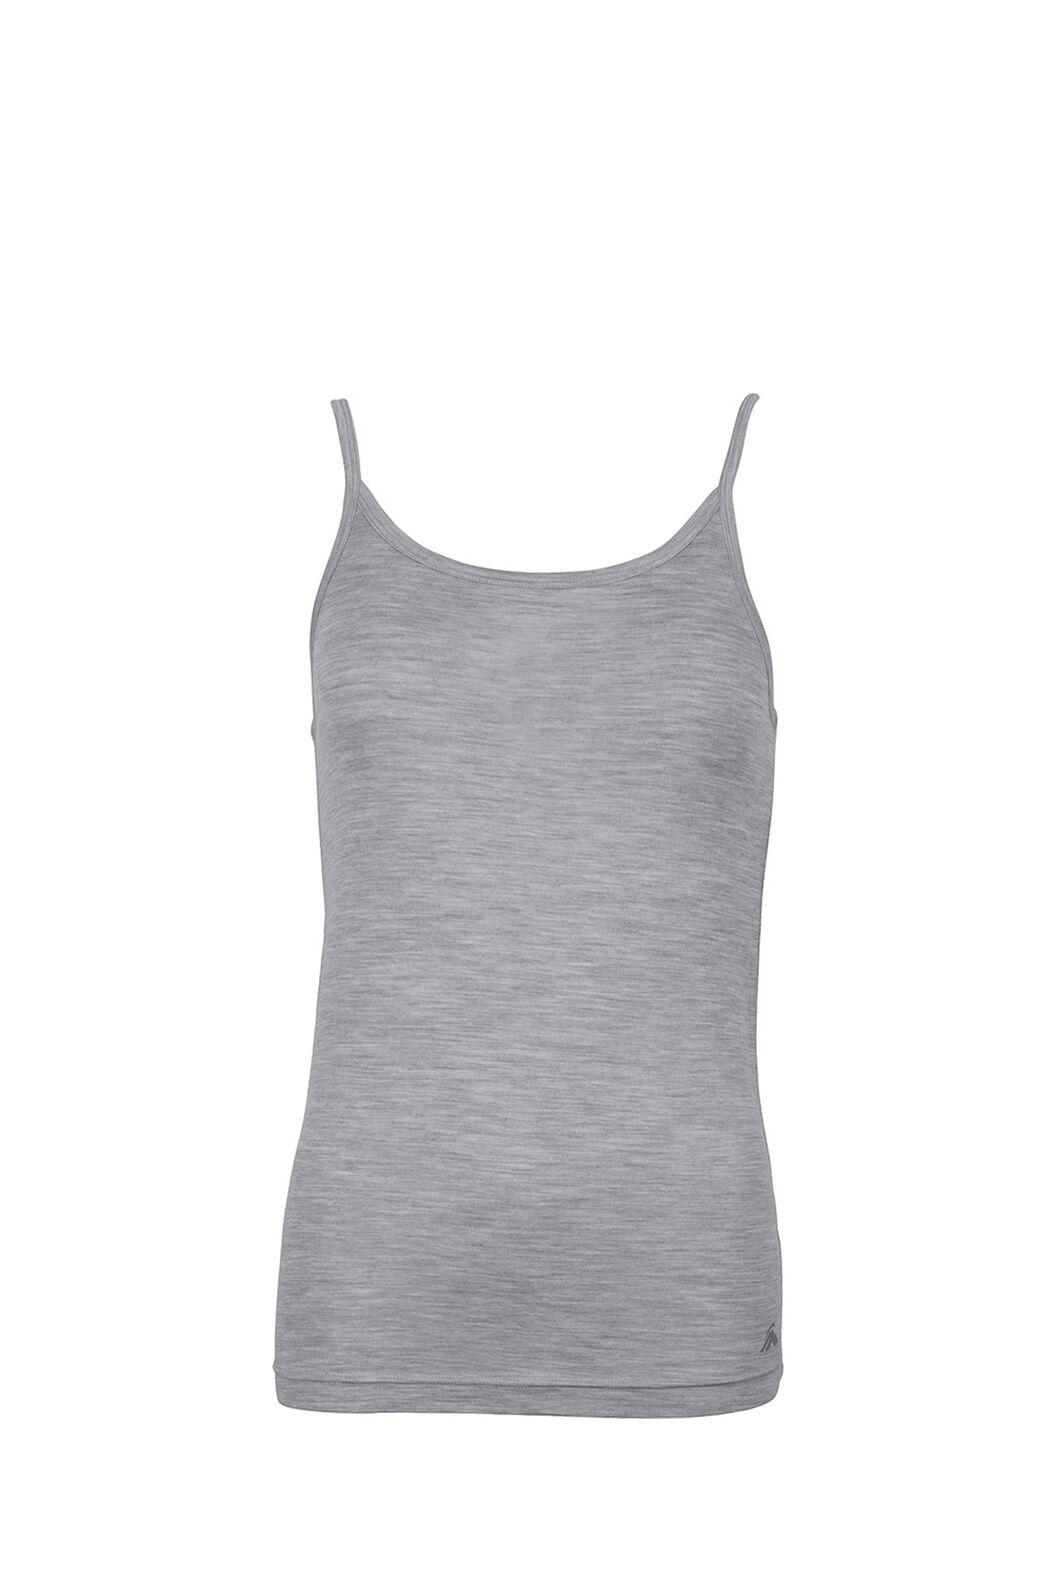 Macpac 150 Merino Camisole — Women's, Light Grey Marle, hi-res